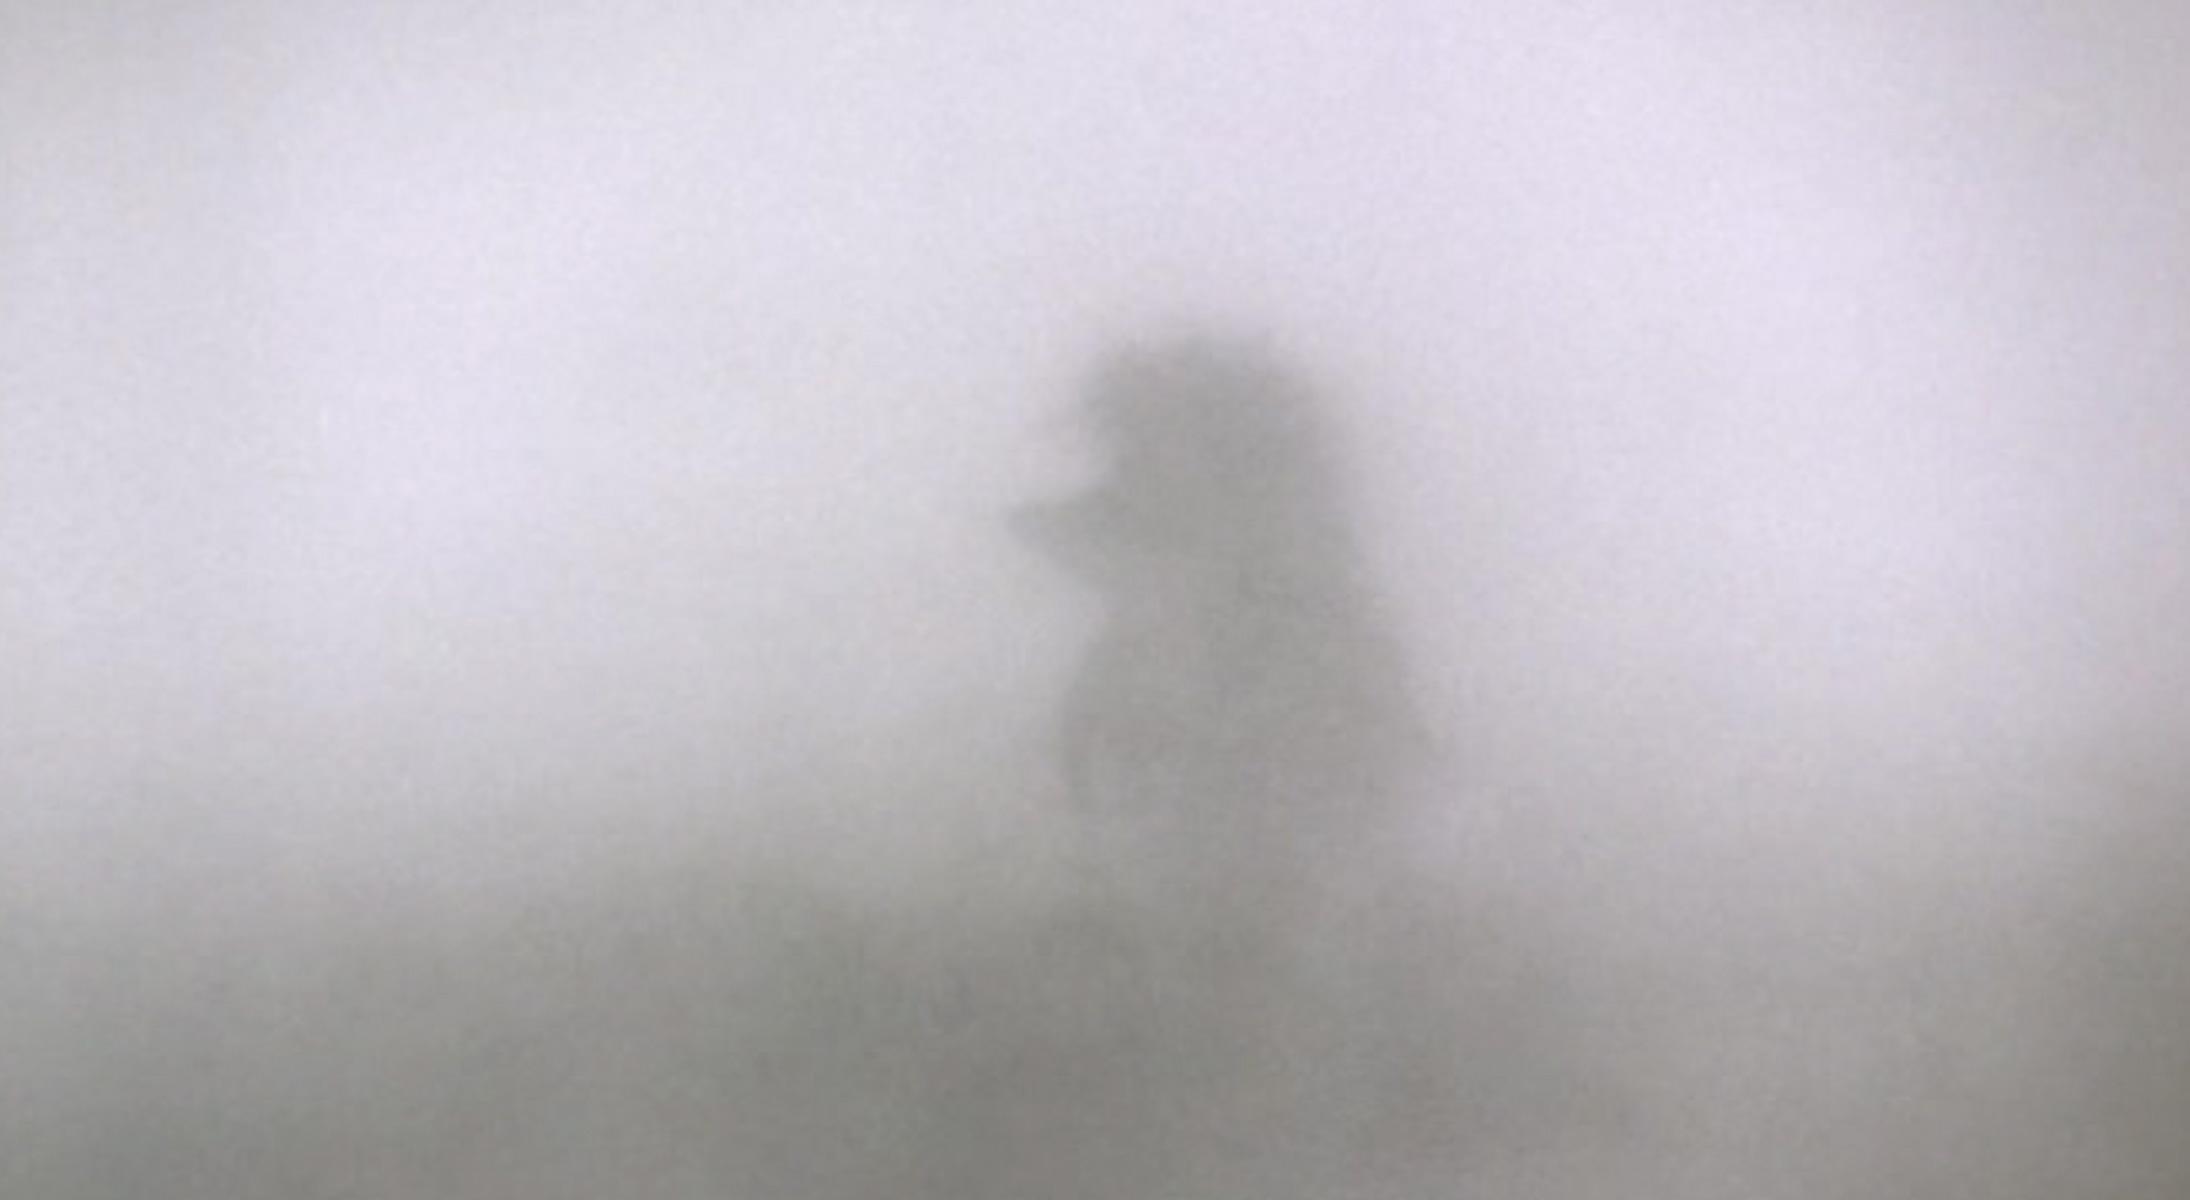 метафора человека в тумане